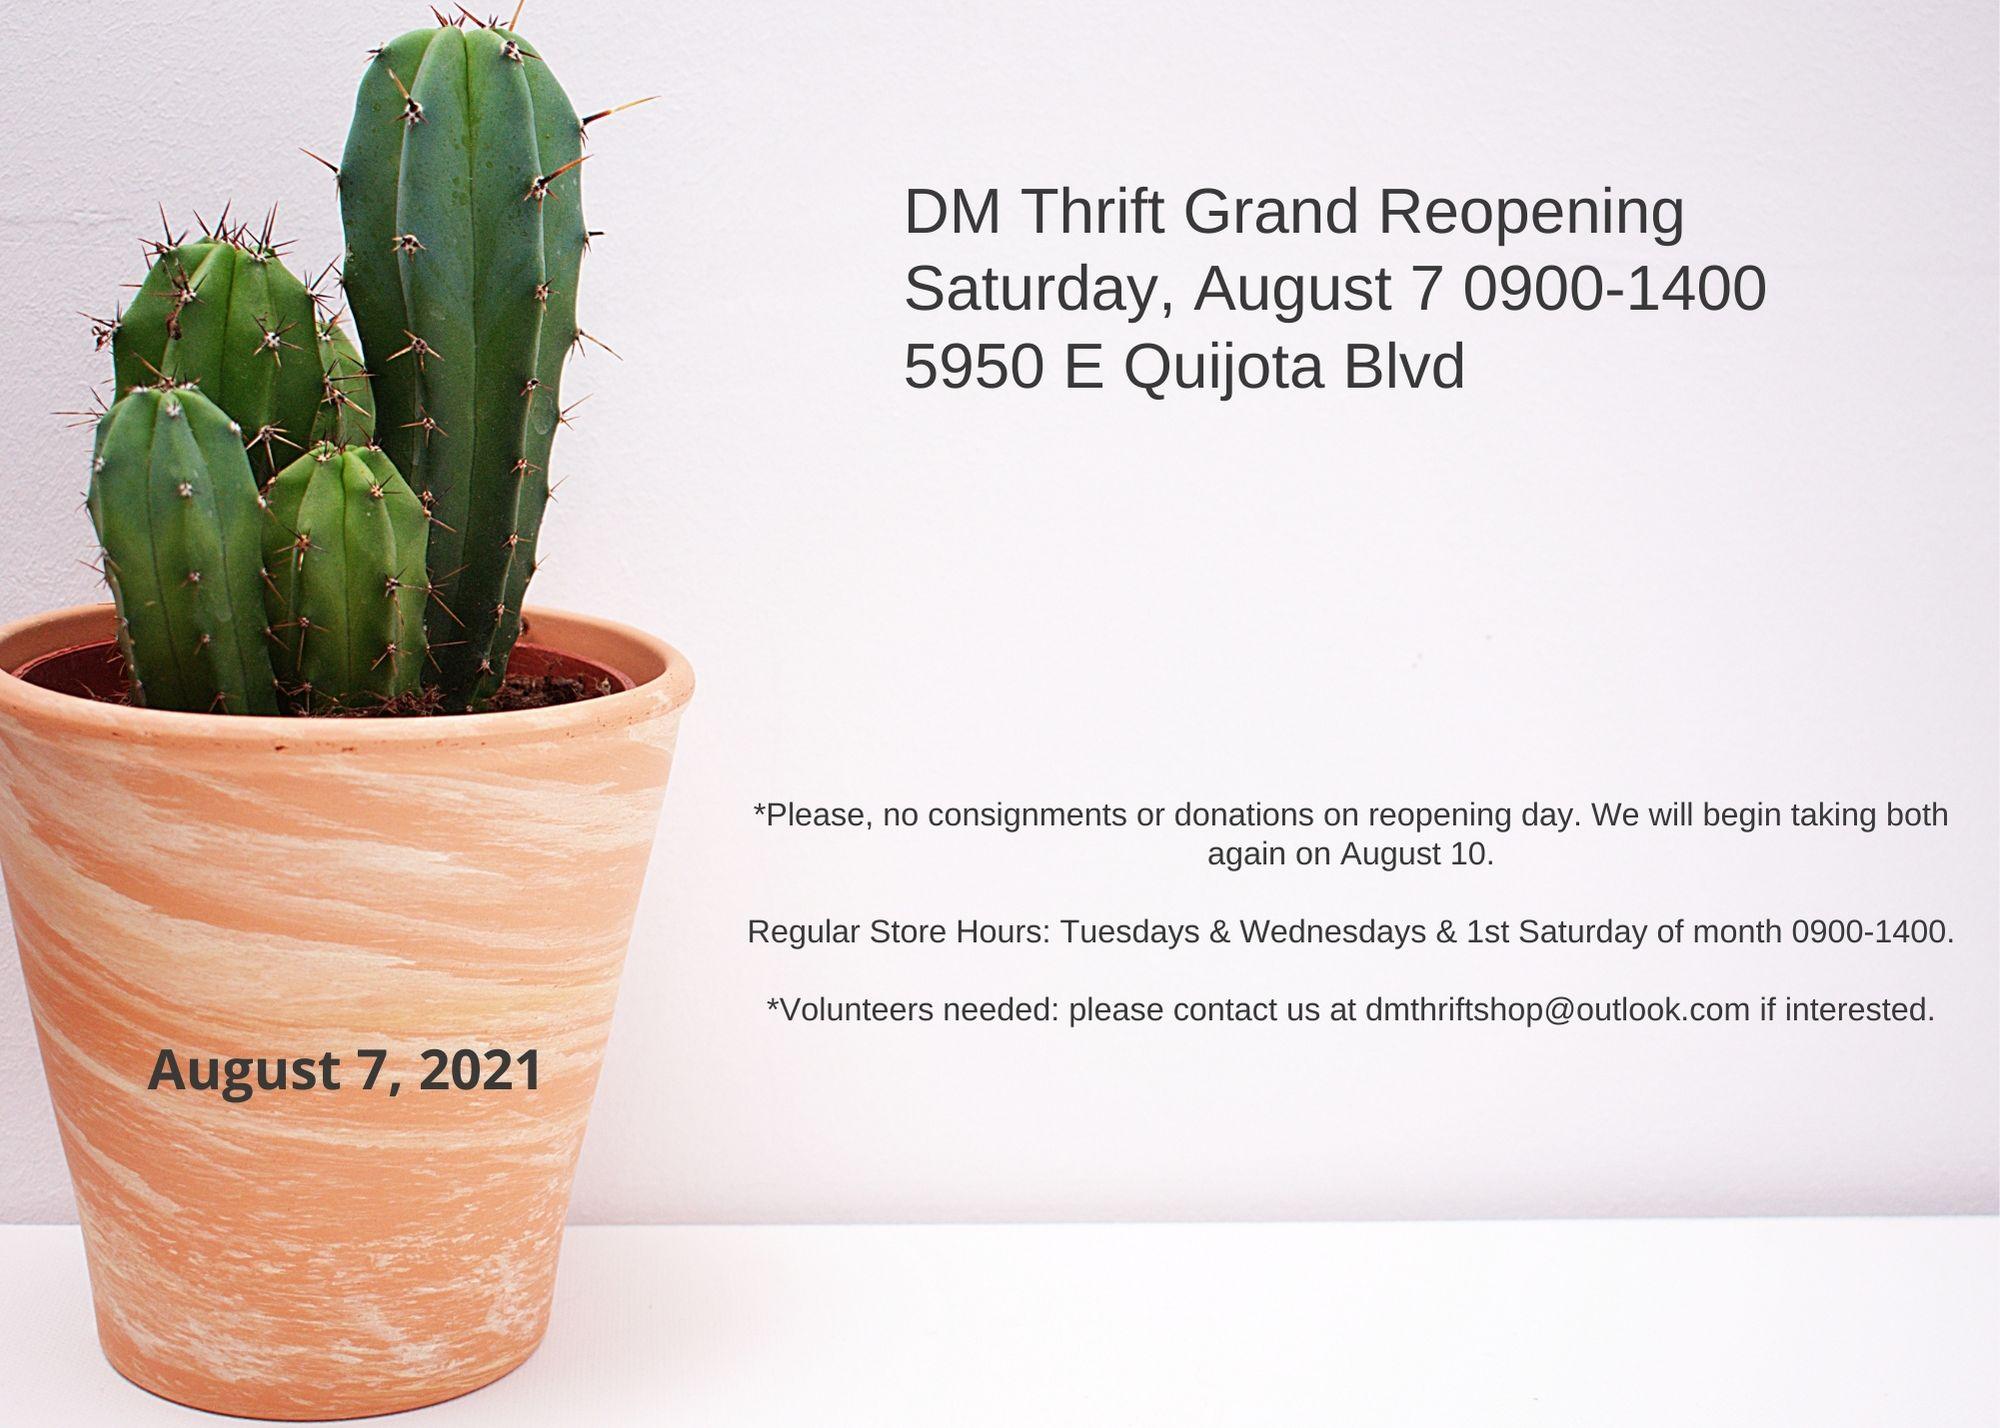 DM Thrift Grand Reopening Saturday, August 7 0900-1400 5950 E Quijota Blvd